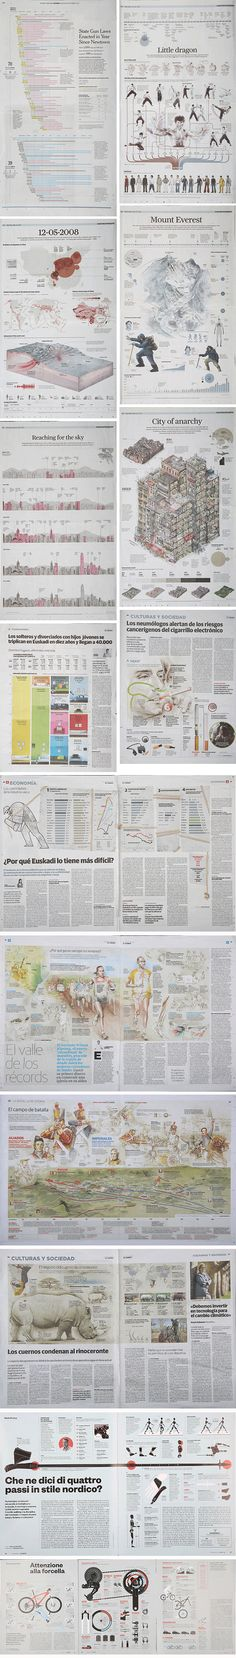 Malofiej Awards #22 for Data Visualization & Infographics: Gold winners